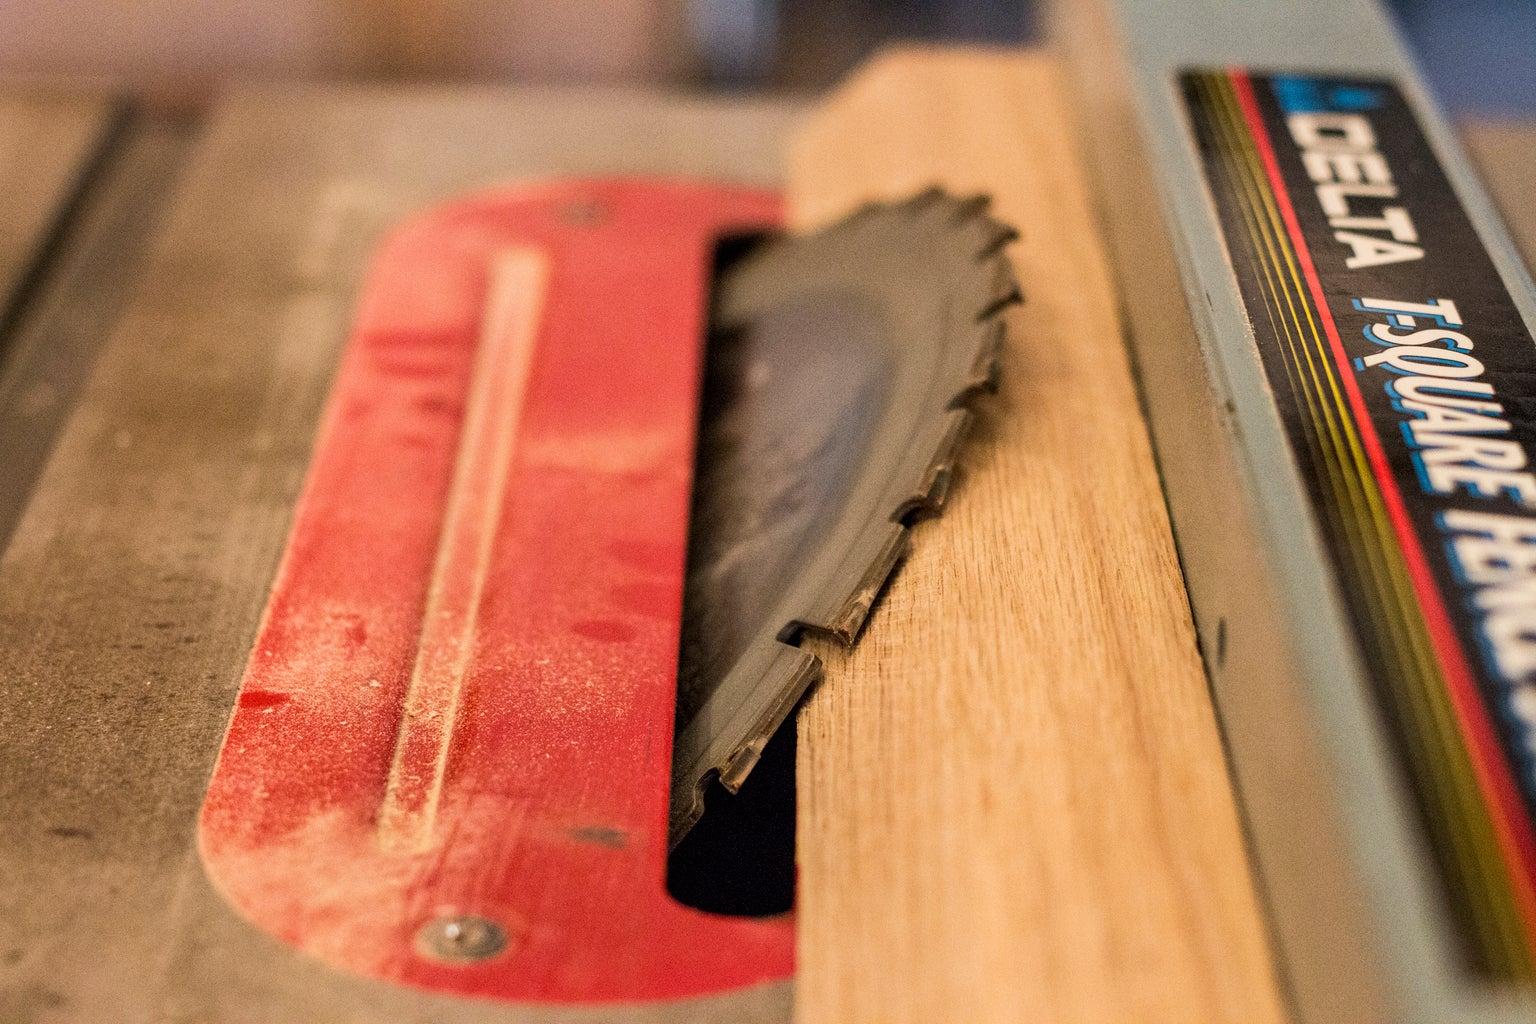 Cutting Cleats